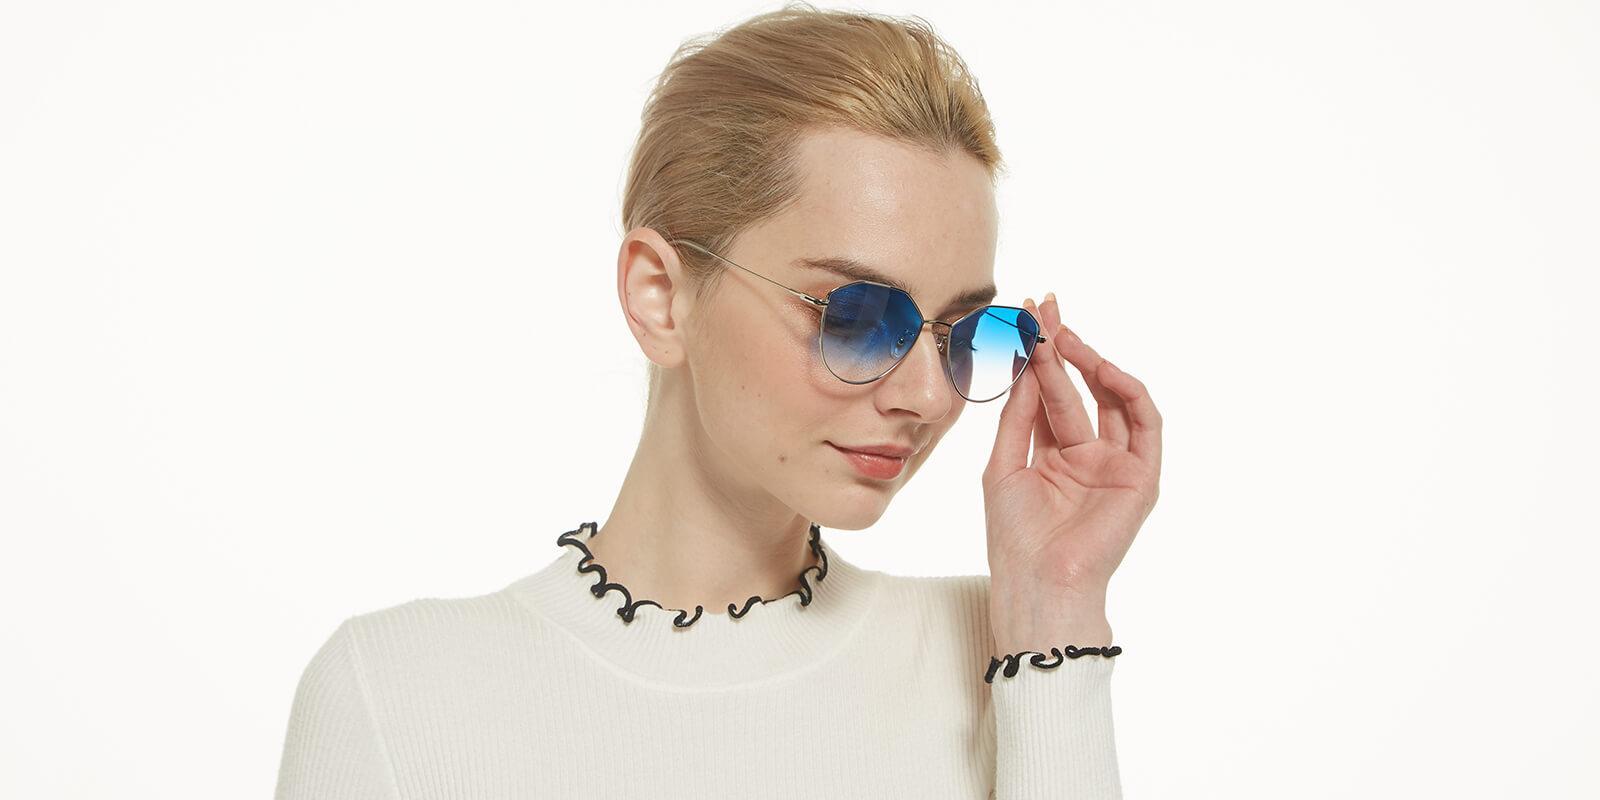 Surberly-Silver-Metal-Eyeglasses-detail2